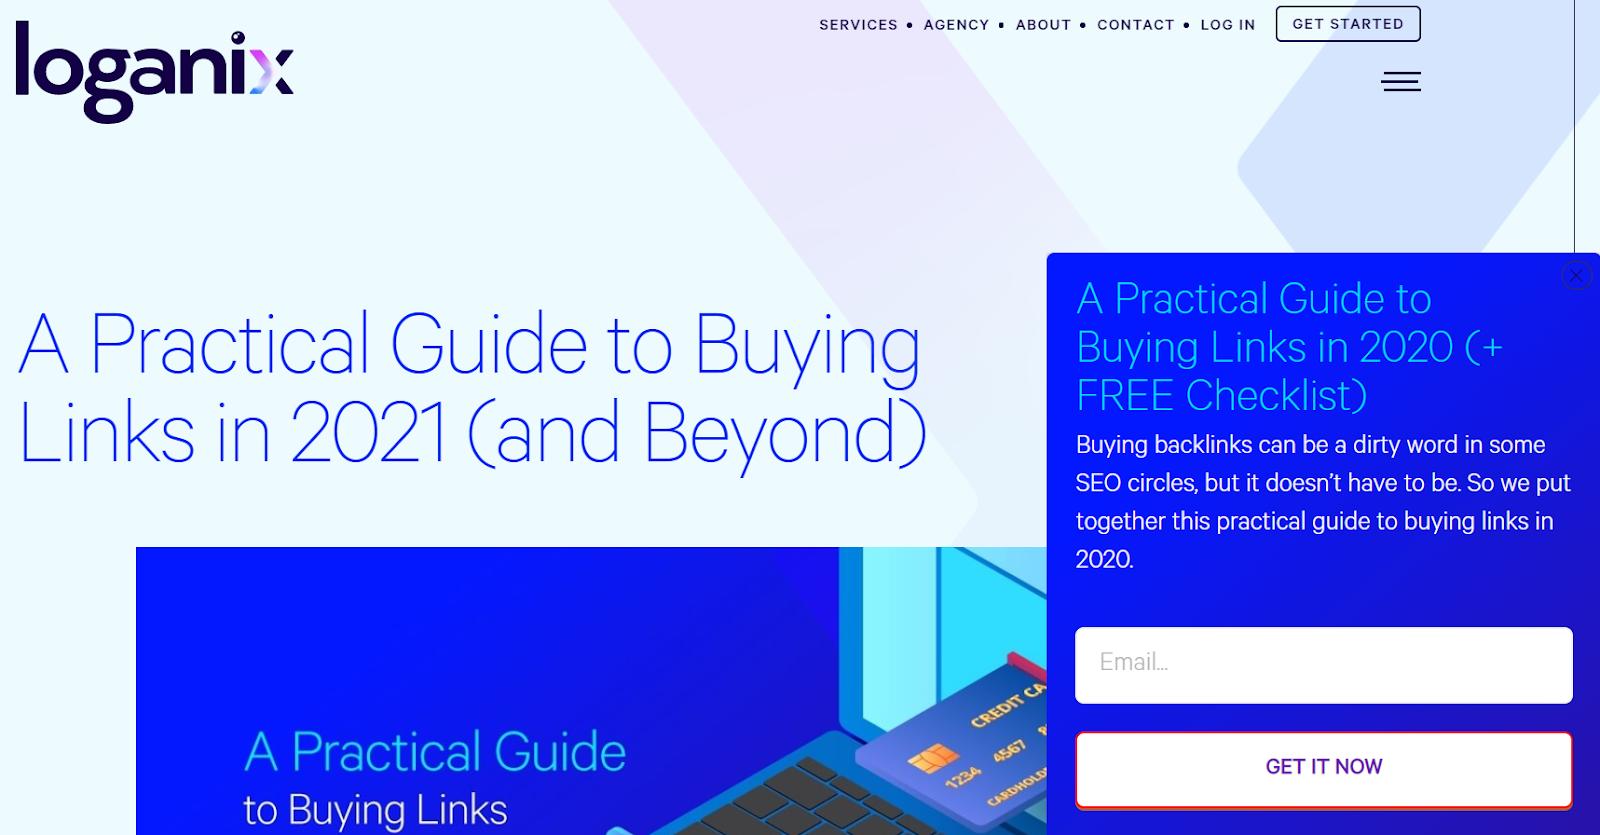 loganix practical guide to buying links 2021